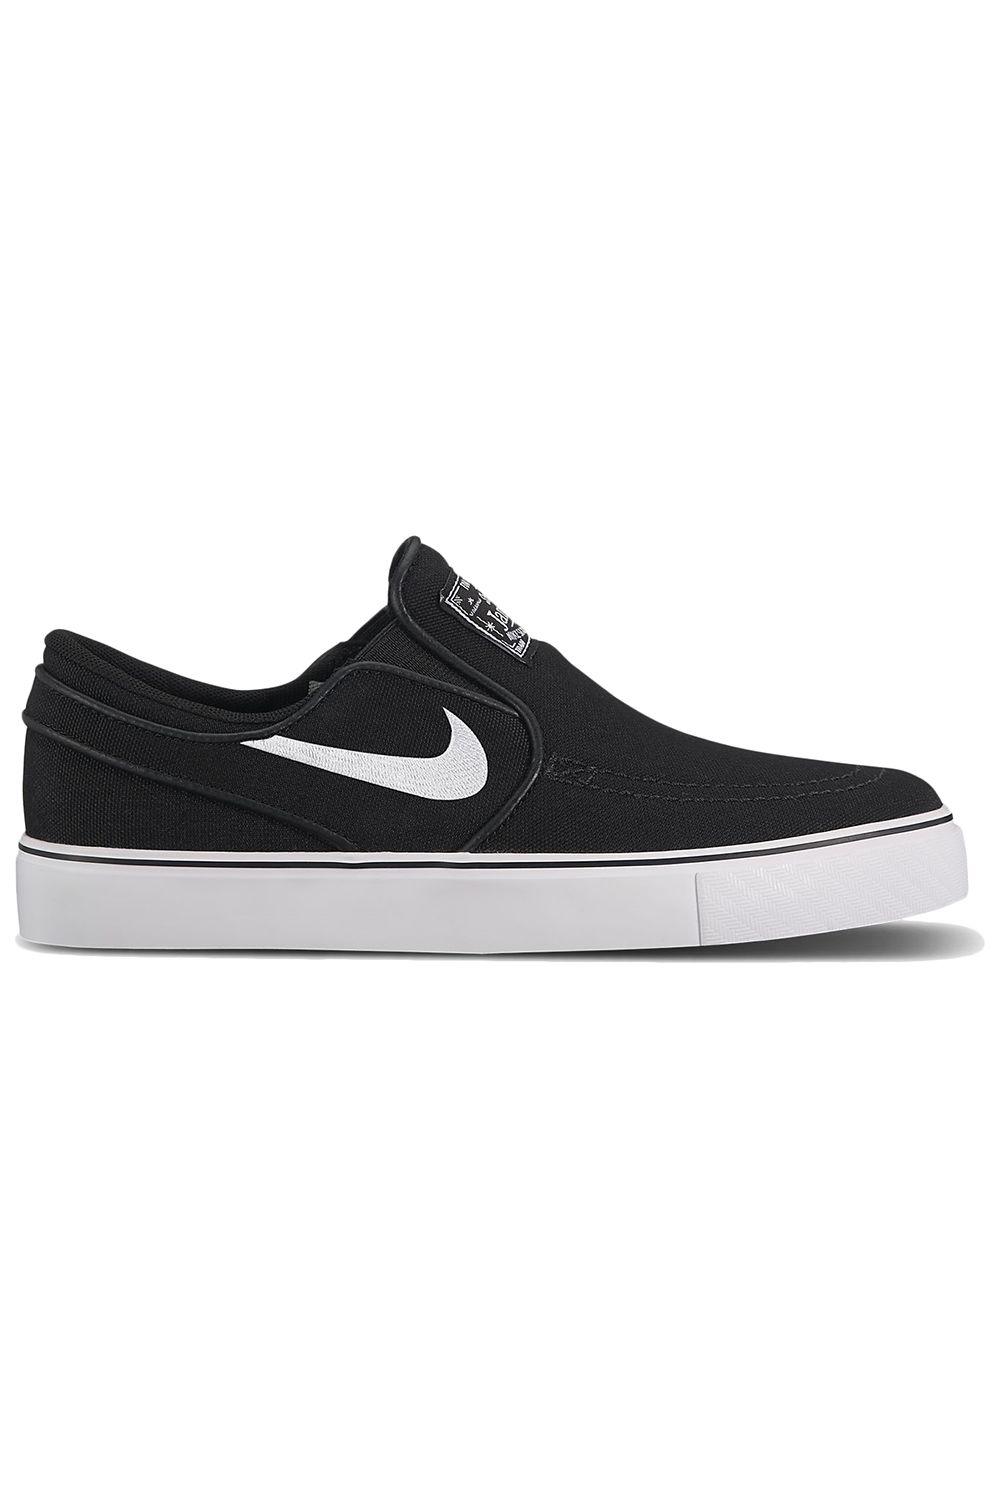 Tenis Nike Sb STEFAN JANOSKI CANVAS SLIP Black/White